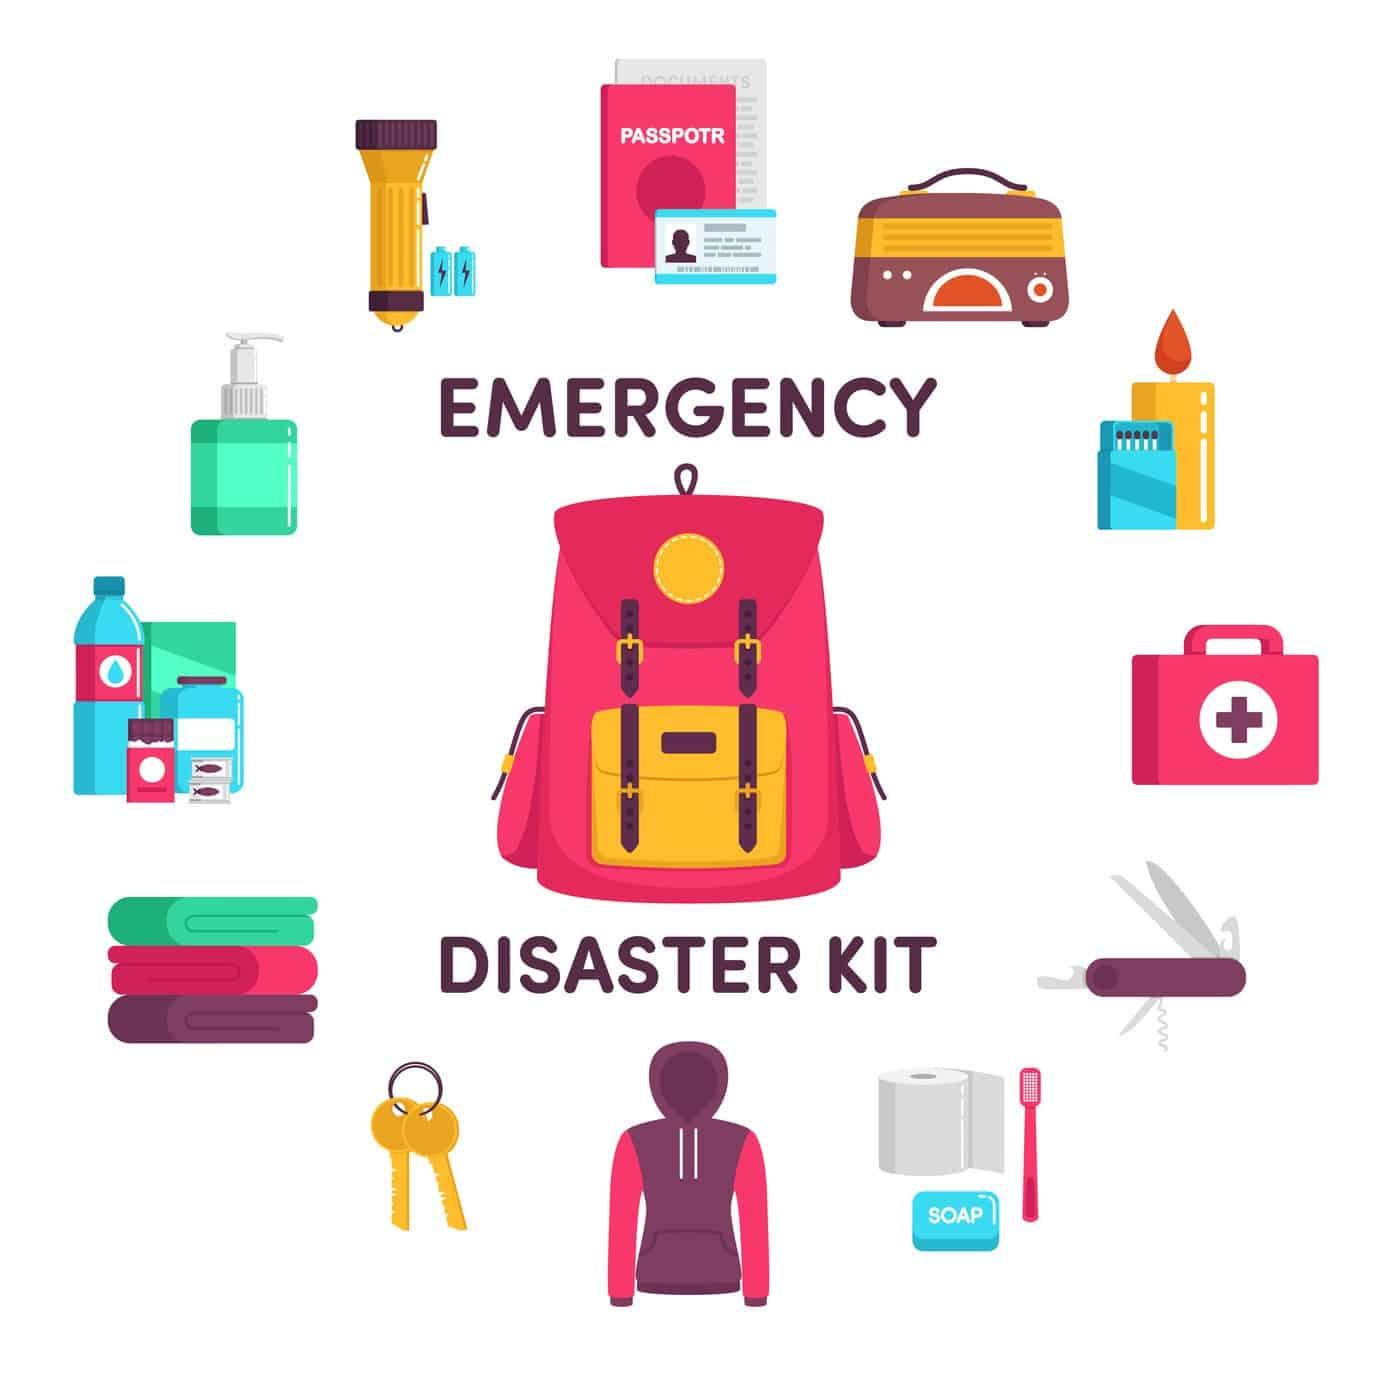 Emergency clipart emergency backpack. Essential hurricane supplies to